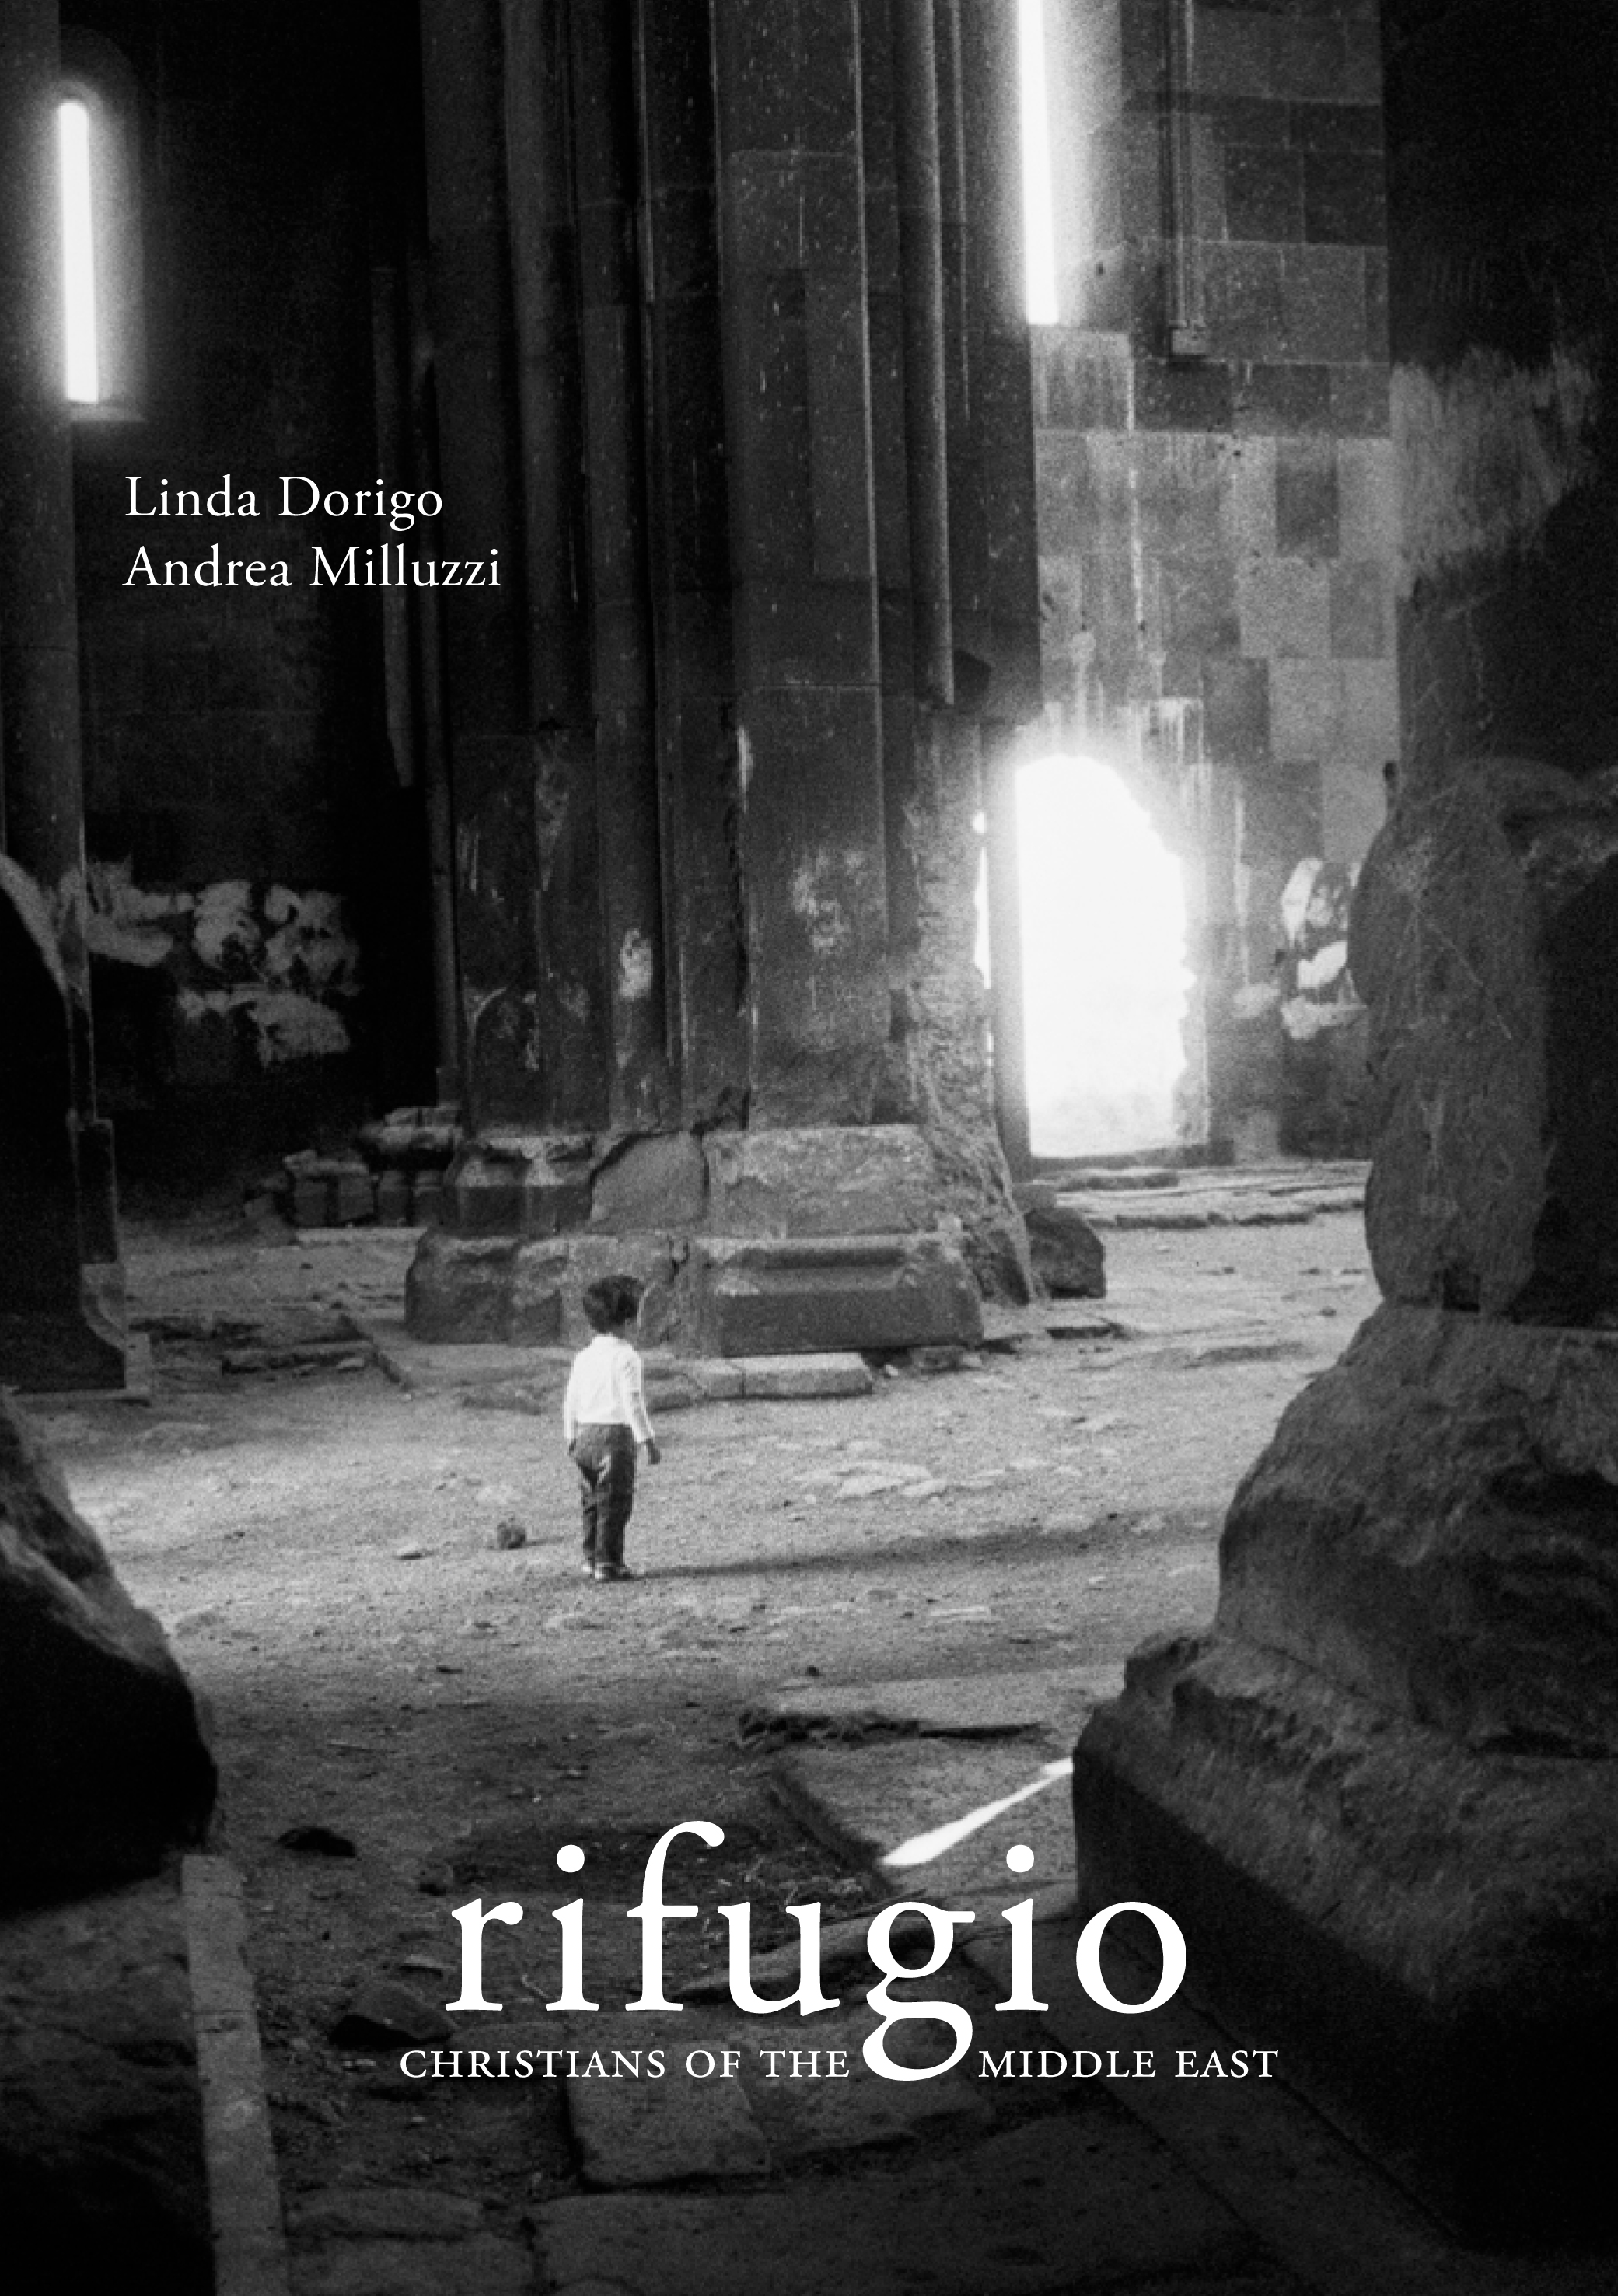 linda-dorigo-andrea-milluzzi-rifugio-cover